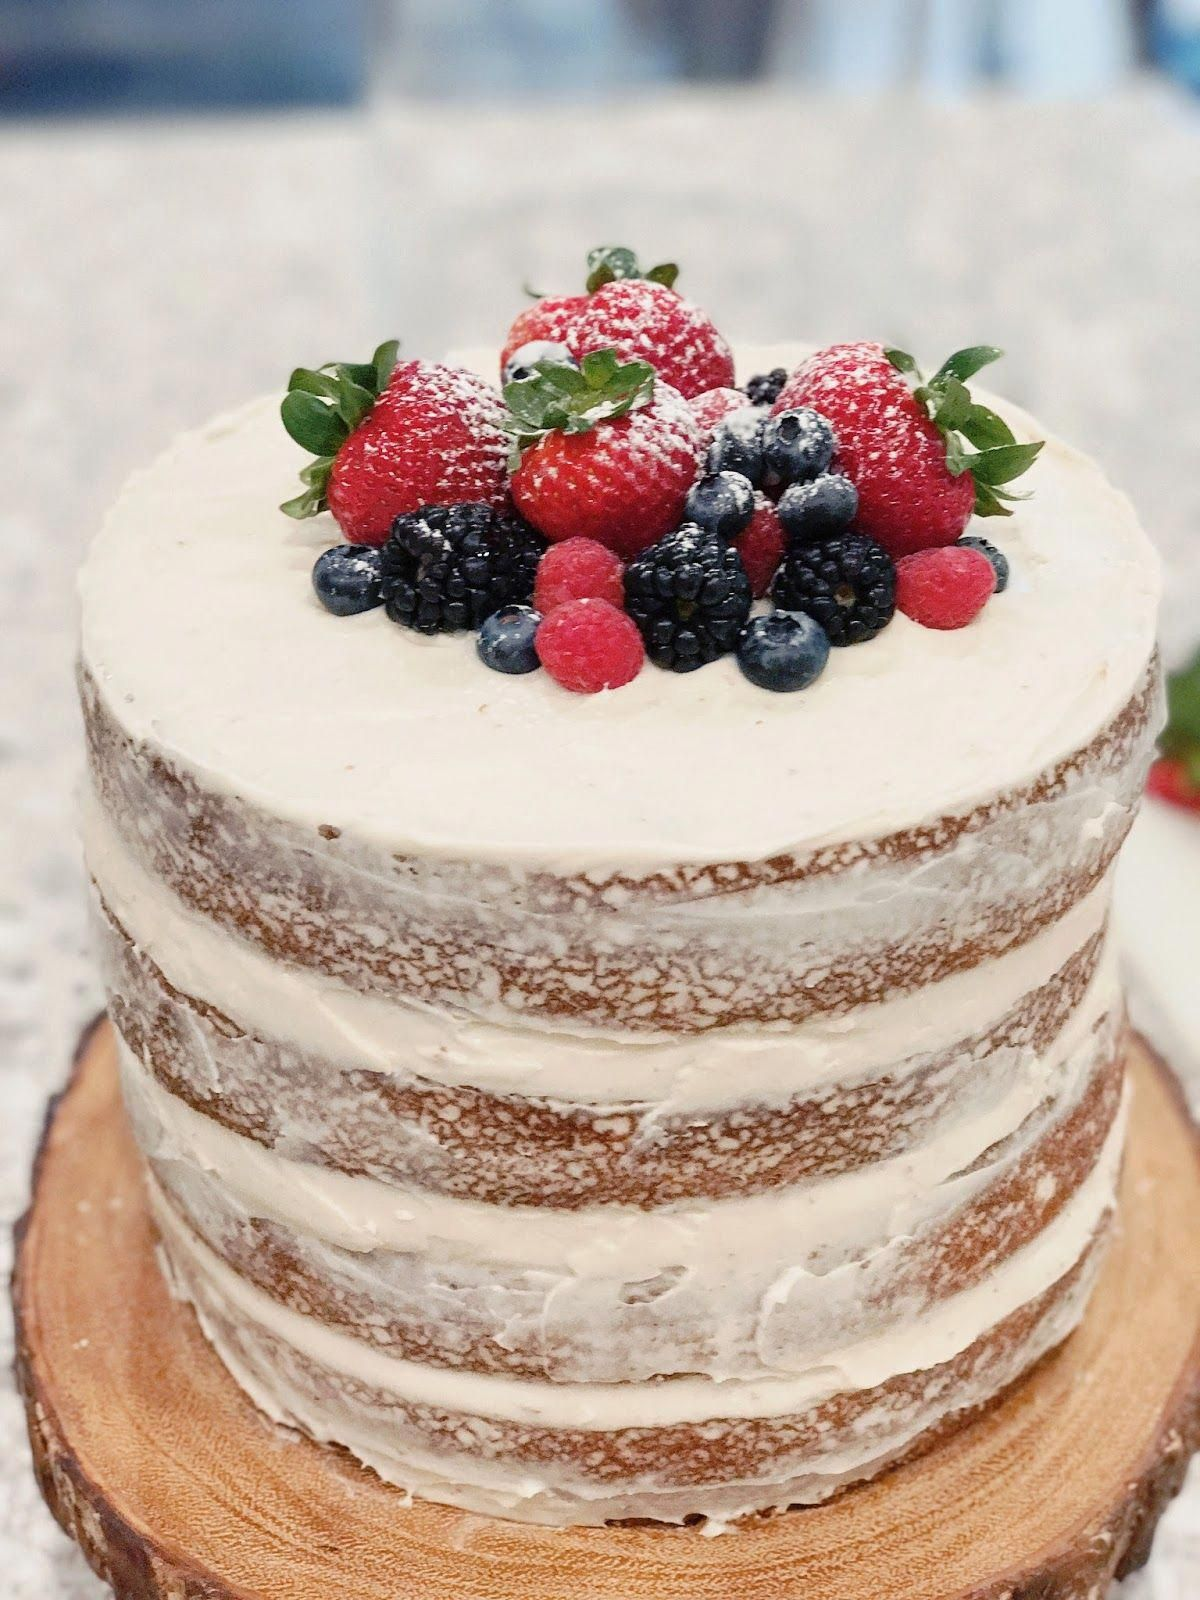 Mug cake gingerbread mug | Recipe in 2020 (With images ...